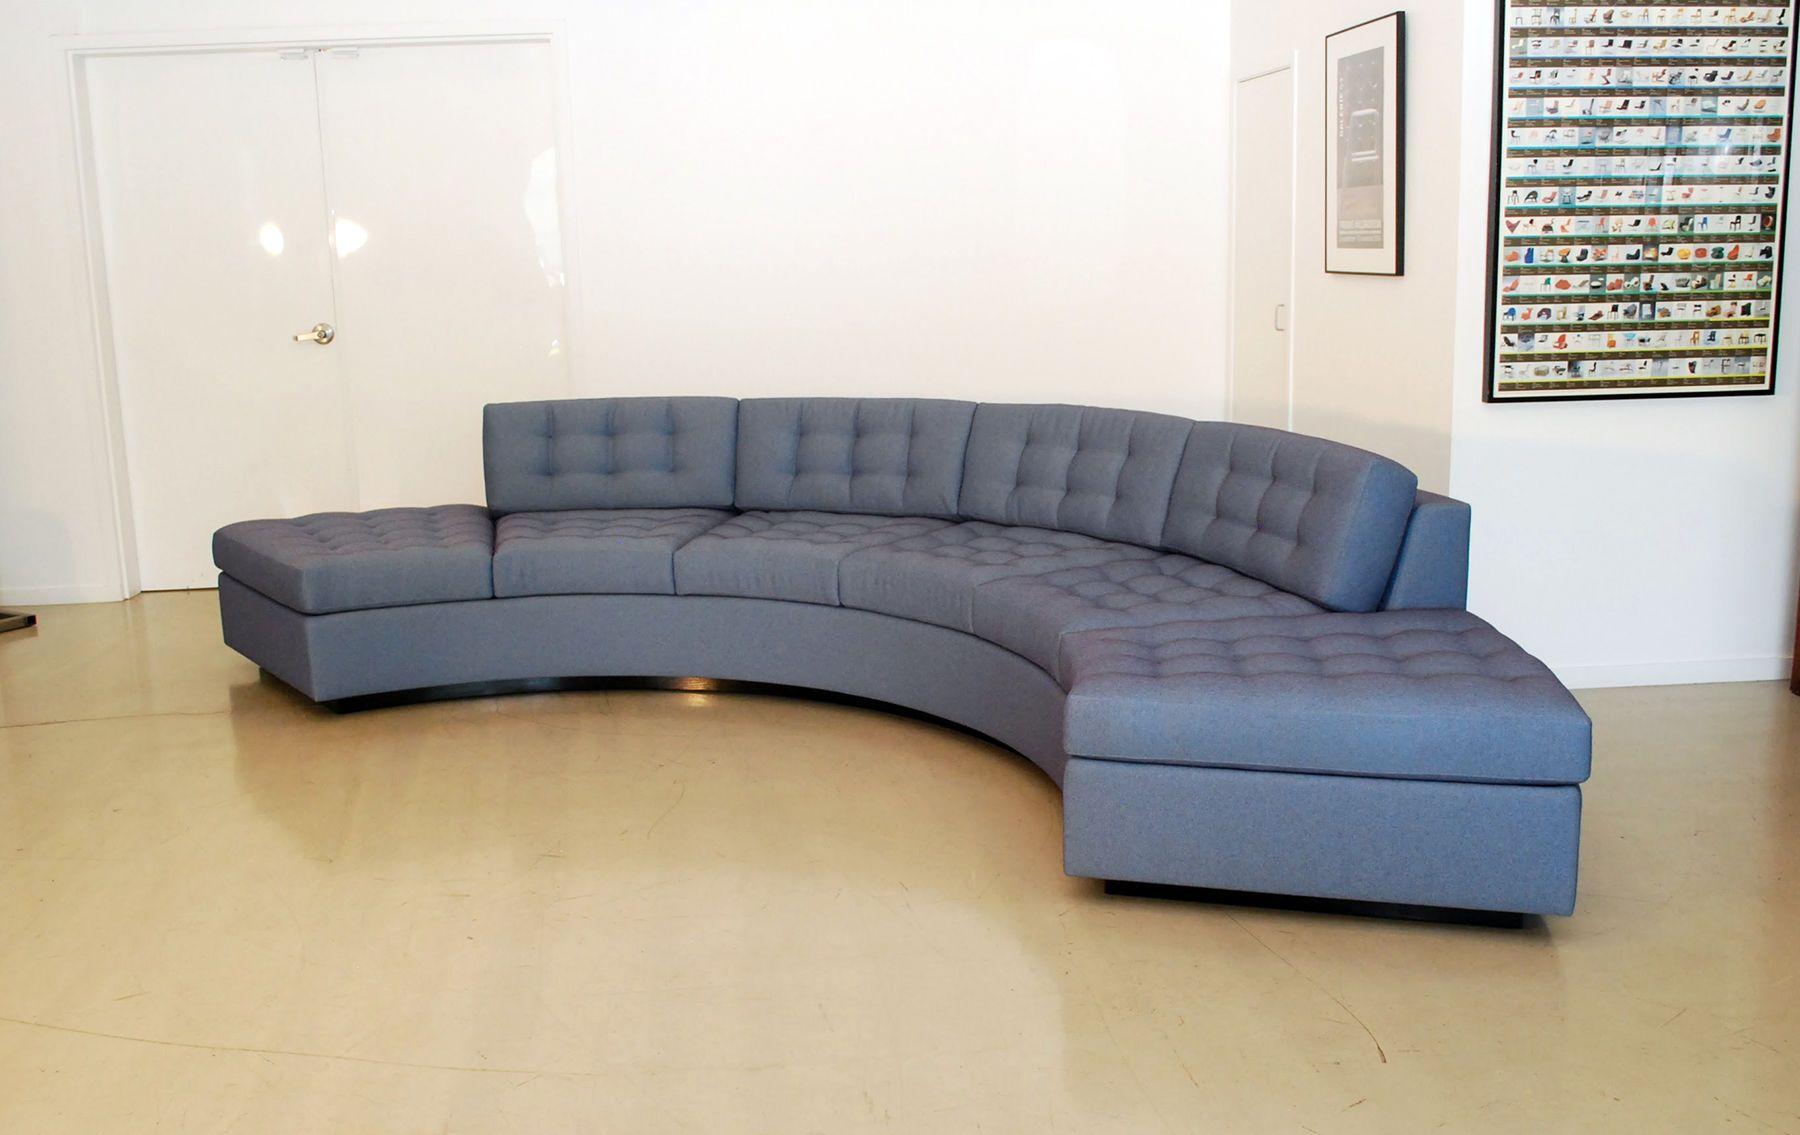 Milo Baughman Inspired Curved Sofa; Milo Baughman Inspired Sofa ...